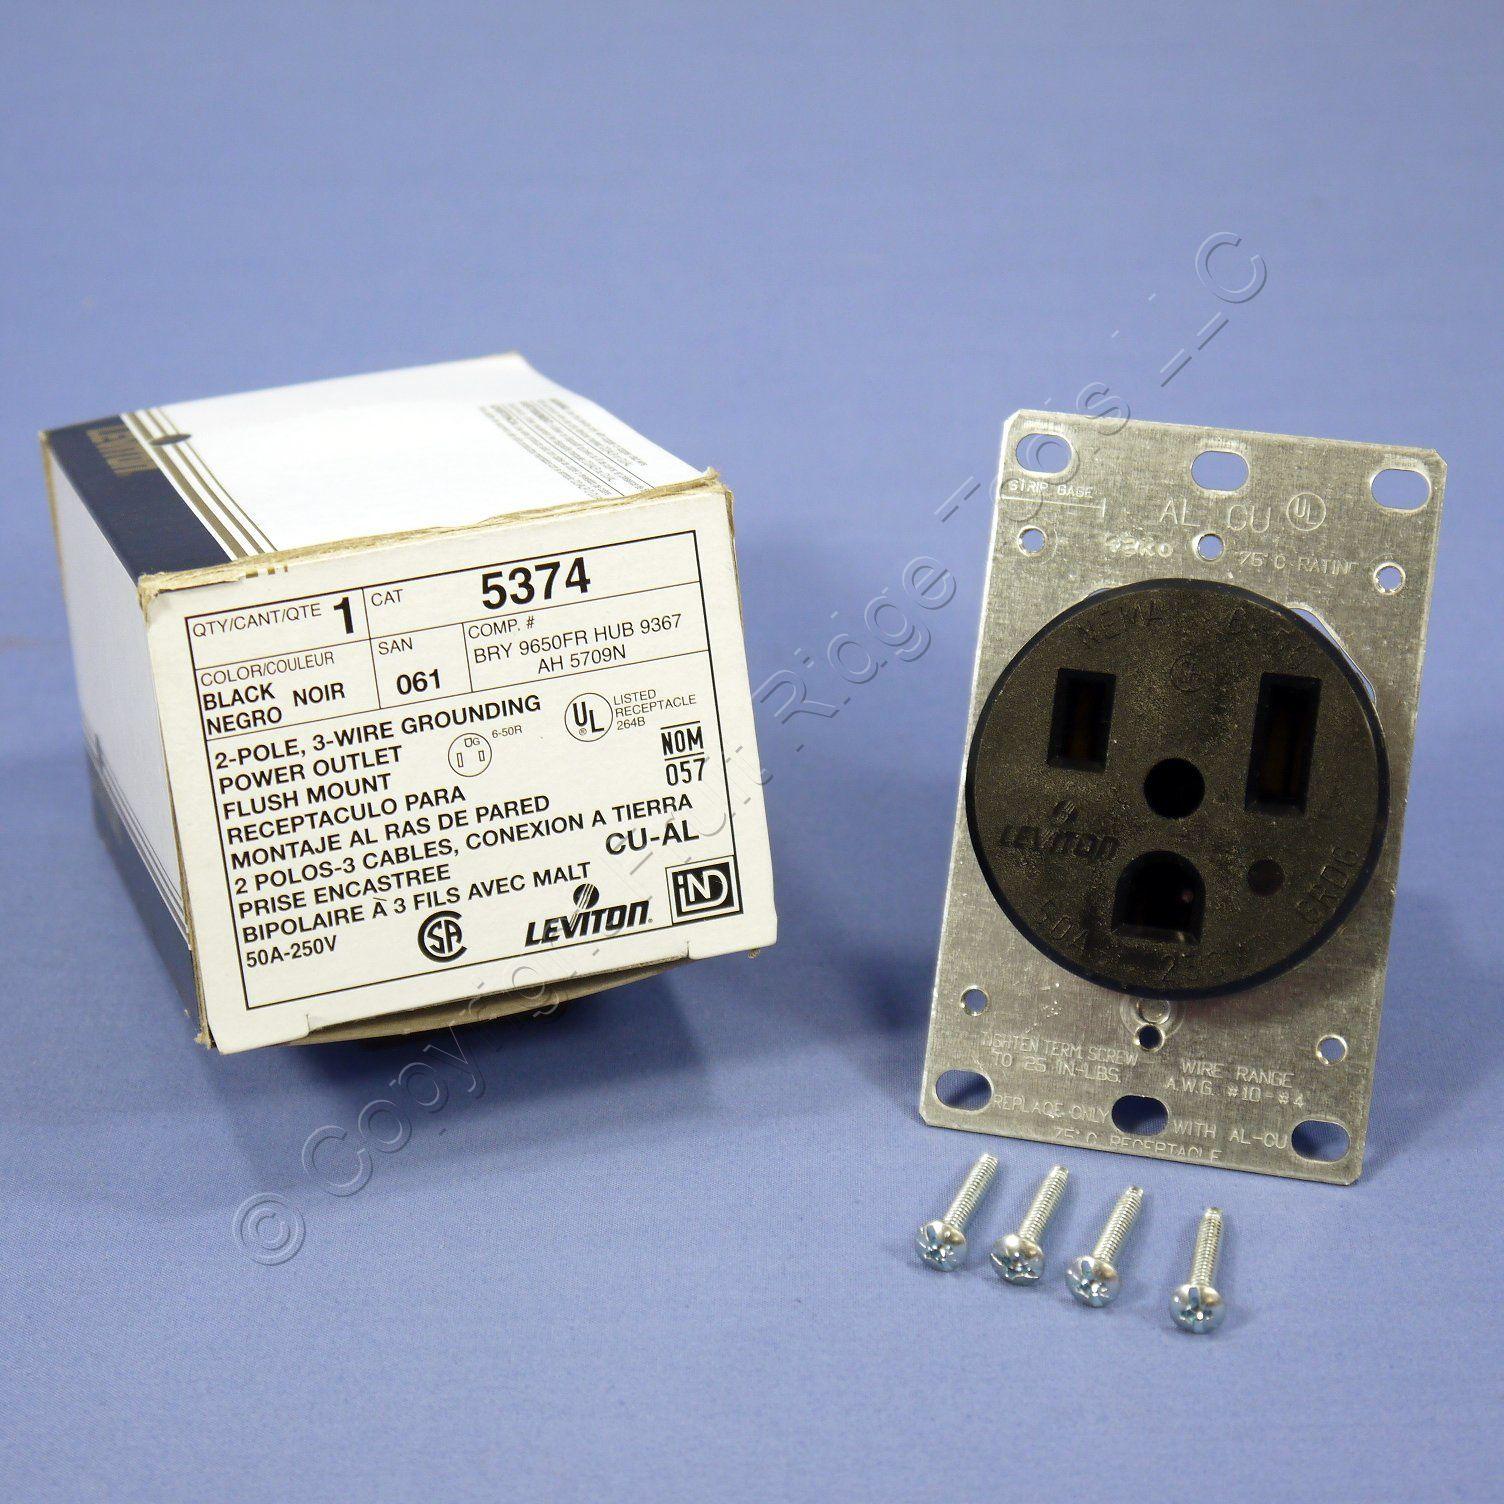 Wiring Diagram Welder Outlet : A v welder wiring diagram get free image about